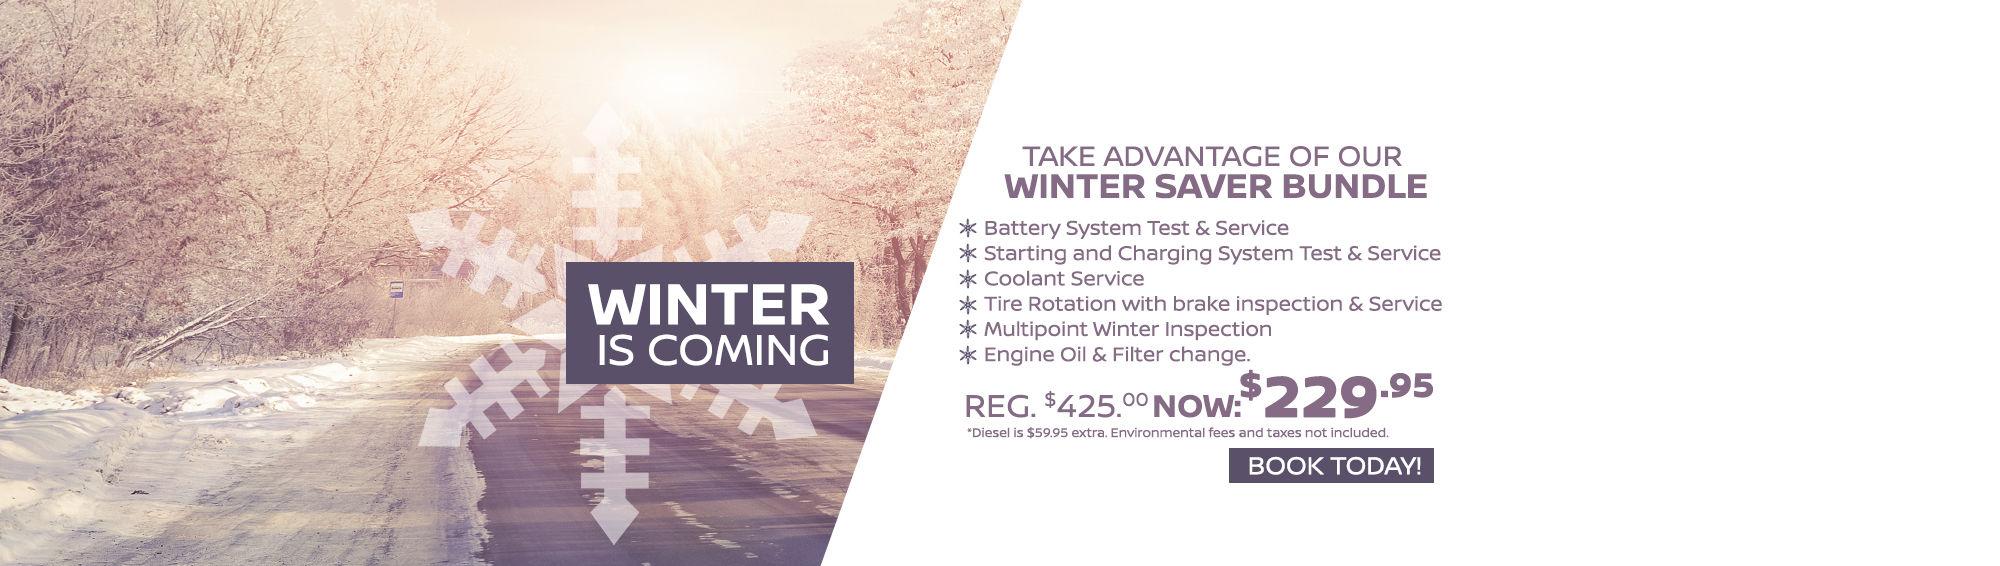 Get Ready for Winter at Gord Scott Nissan! (Desktop)